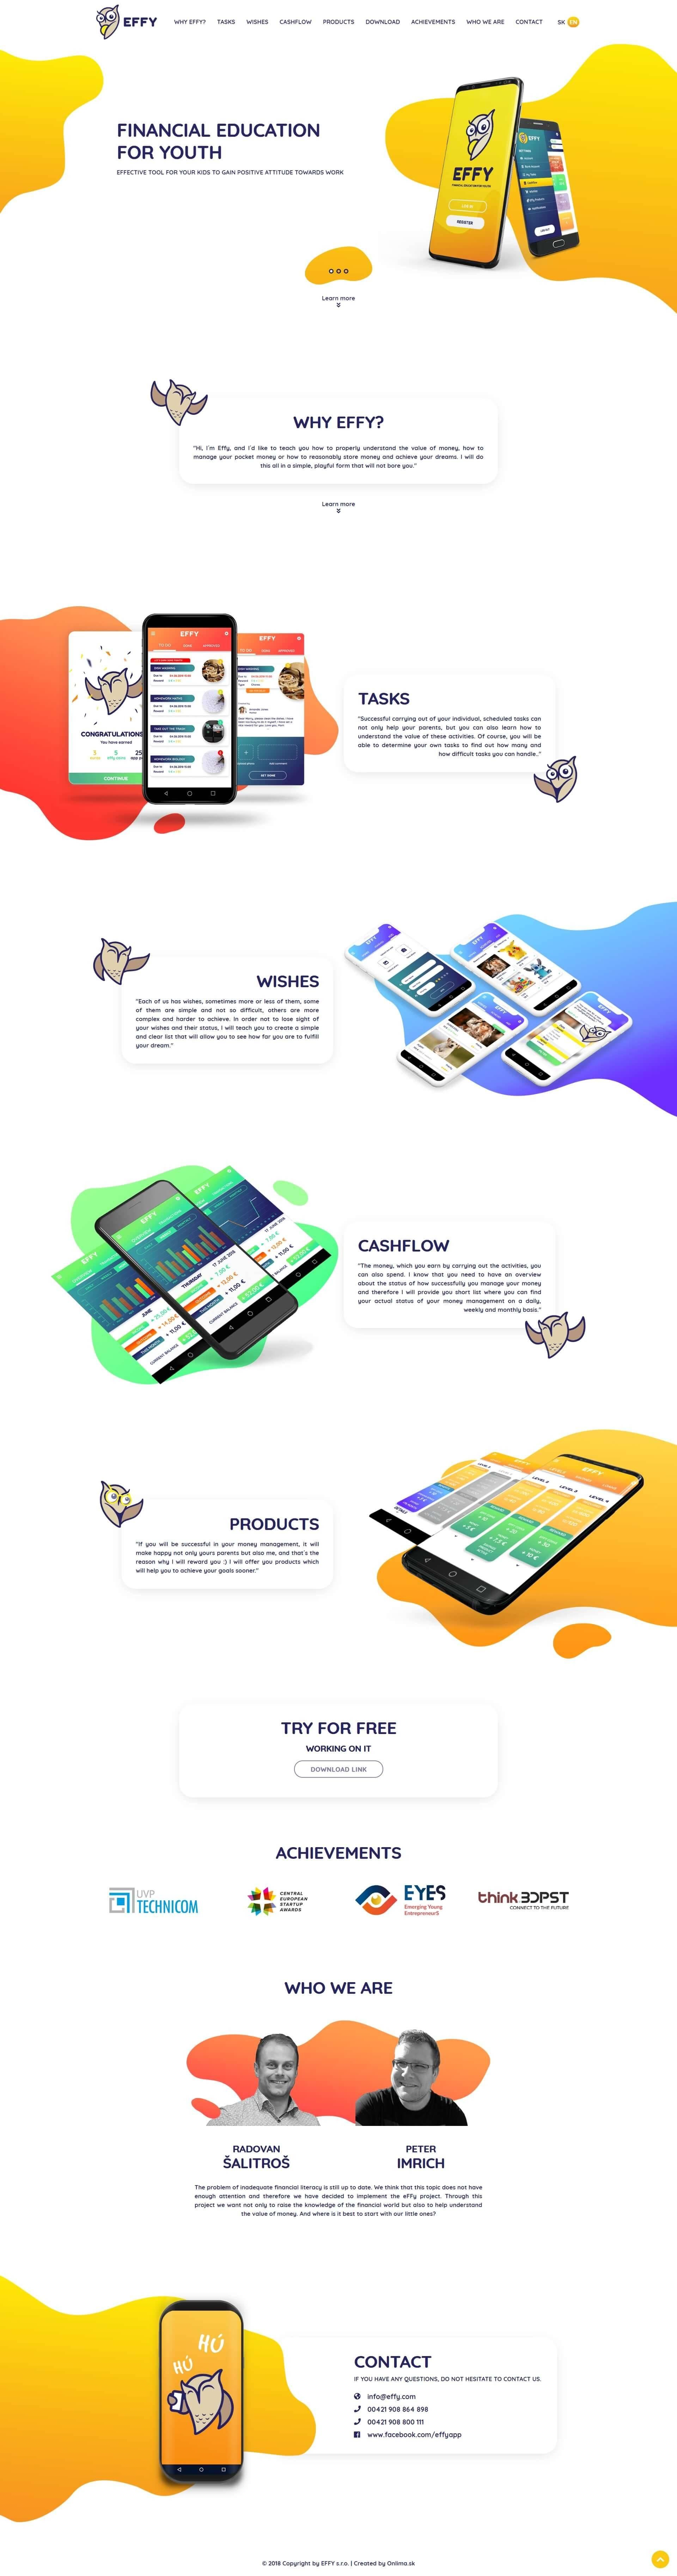 Effy App